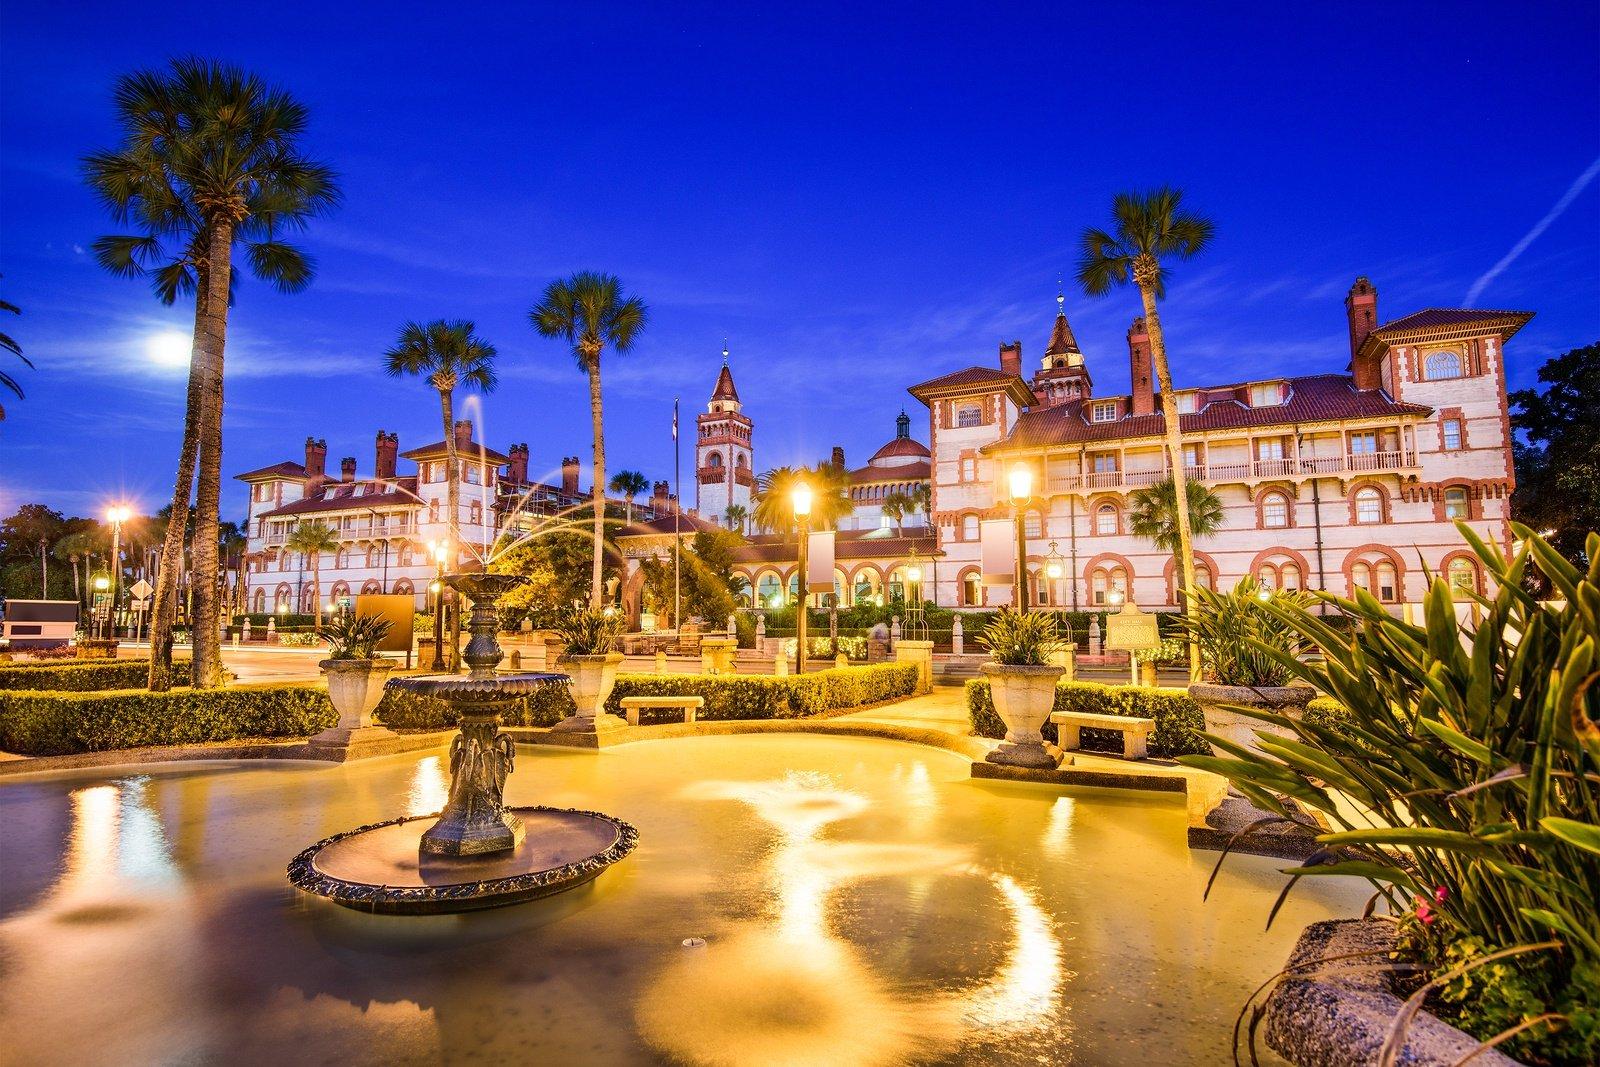 bigstock-St-Augustine-Florida-USA--94760702.jpg